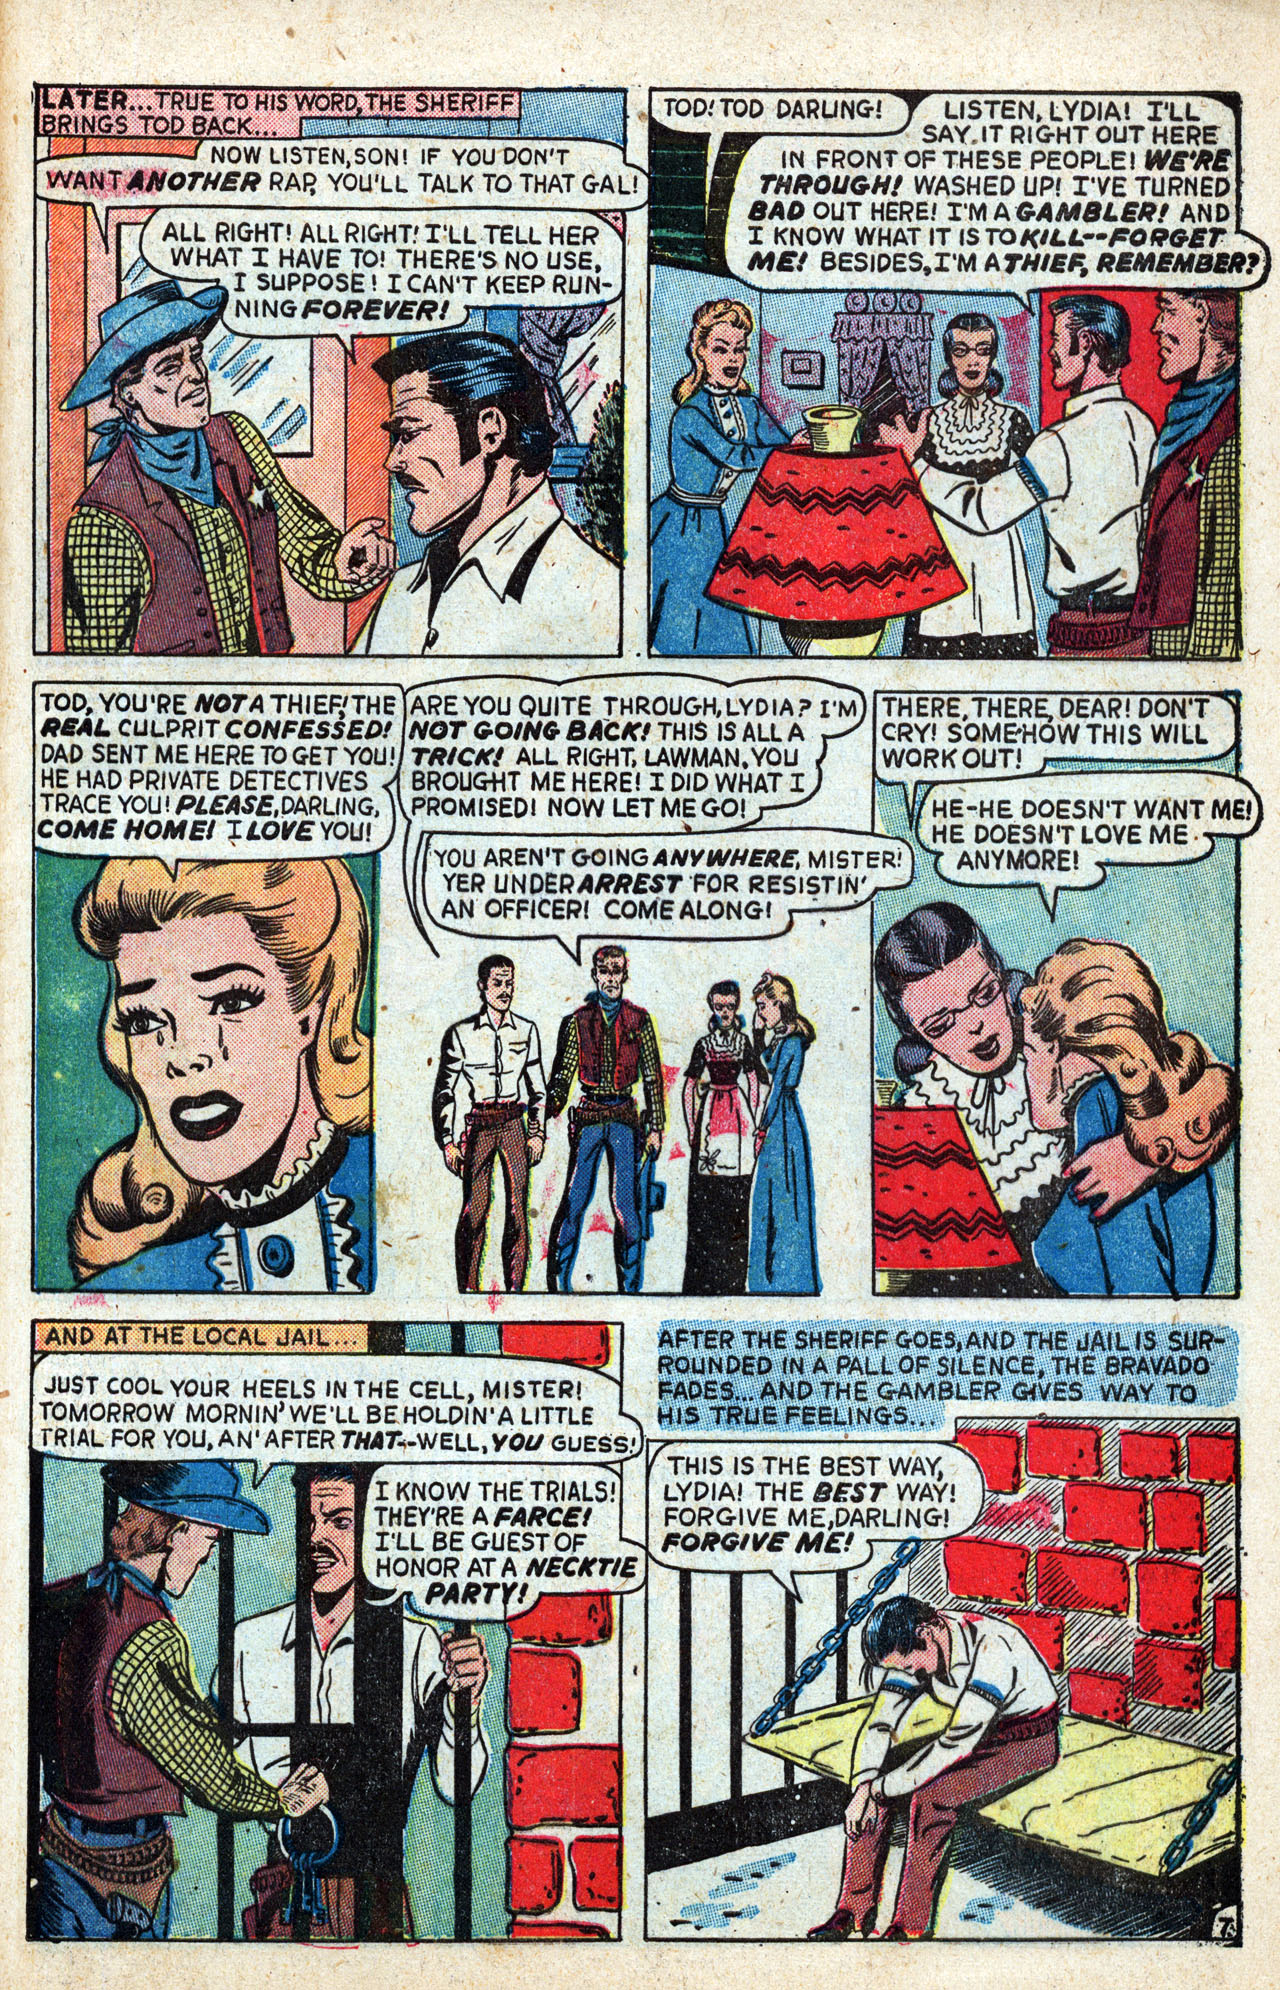 Read online Two-Gun Kid comic -  Issue #4 - 41